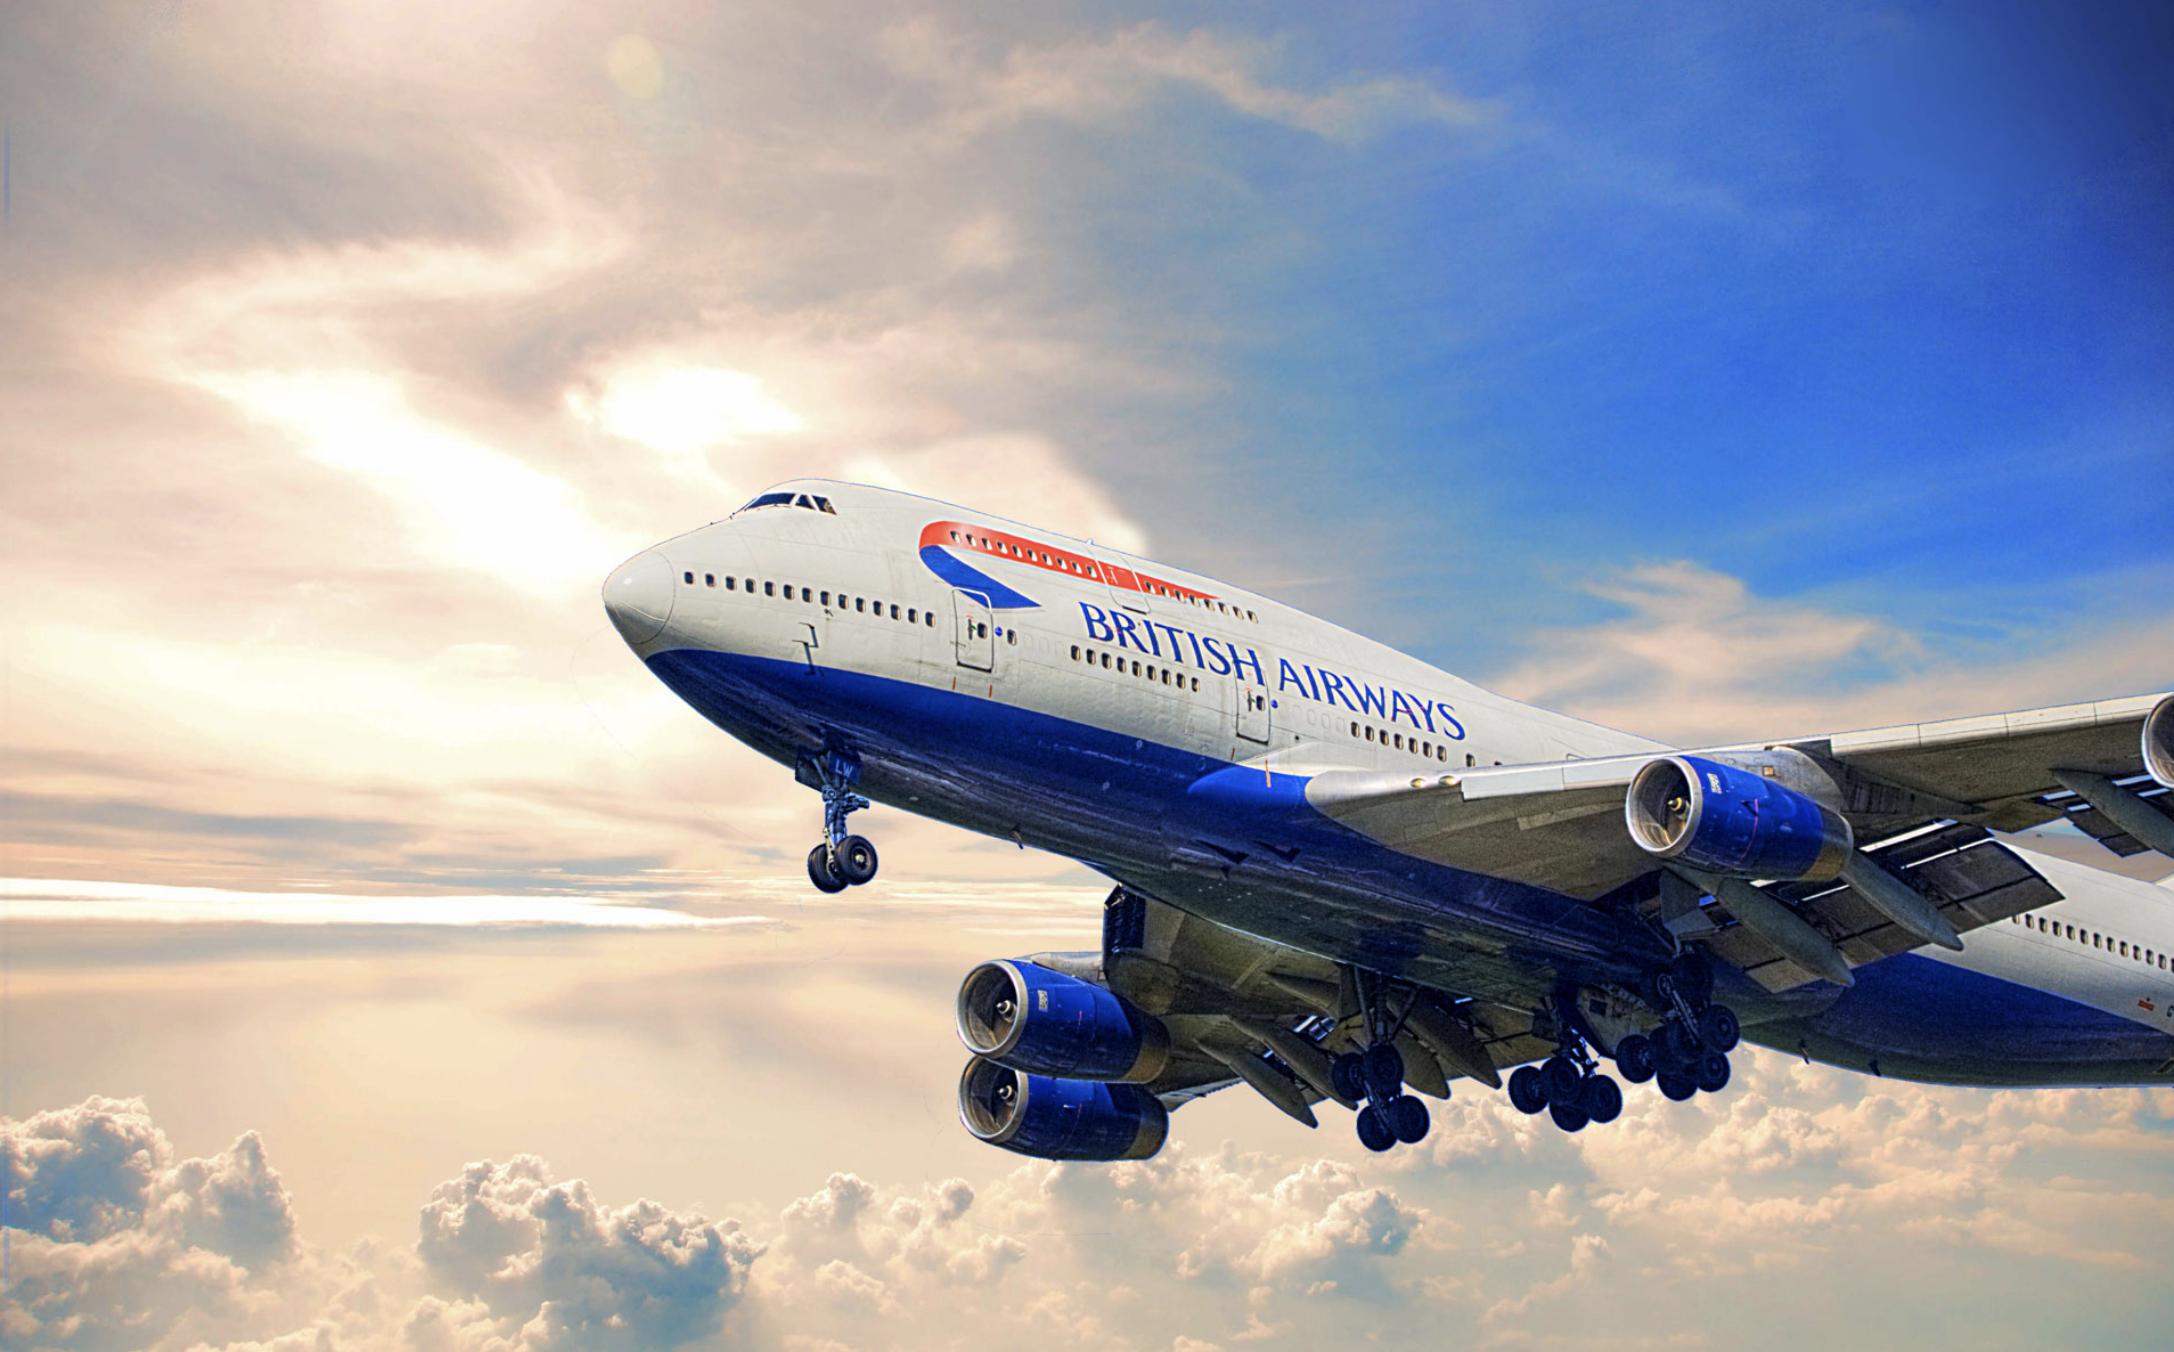 FLIGHT INFO: - DEPARTING Nov 20, 2017:British Airways flight: 174JFK (645p) - LHR (650a) (arriving 11/21/17)ARRIVING Nov 21, 2017:British Airways flight: 554LHR (925a) - FCO (105p)DEPARTING Nov 30, 2017:British Airways flight: 2583VCE (1225p)- GTW (135p)ARRIVING Nov 30, 2017:British Airways flight: 2273TW (135p) - JFK (750p)